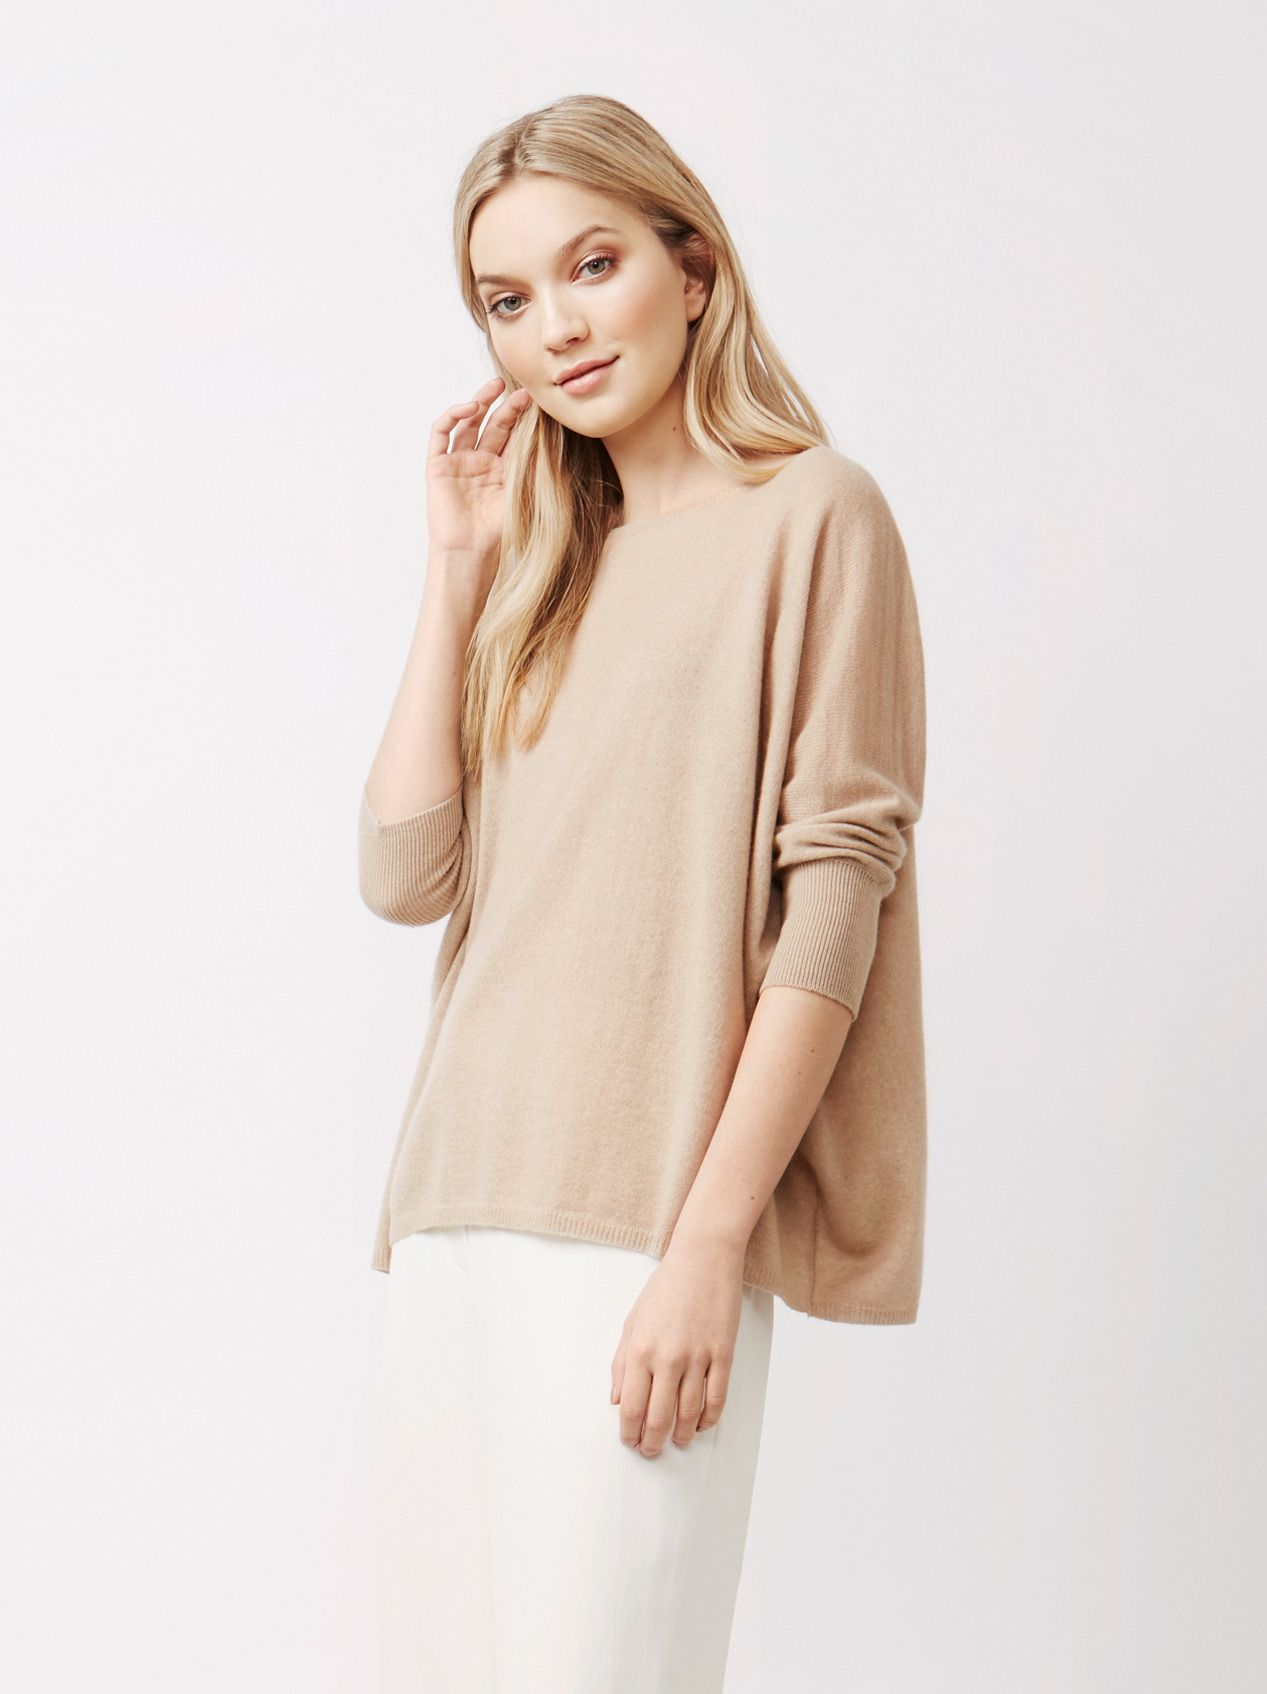 66199f6d7 Soft Goat Women's Short Sleeve Poncho Sand | Garderob | Tunic tops ...